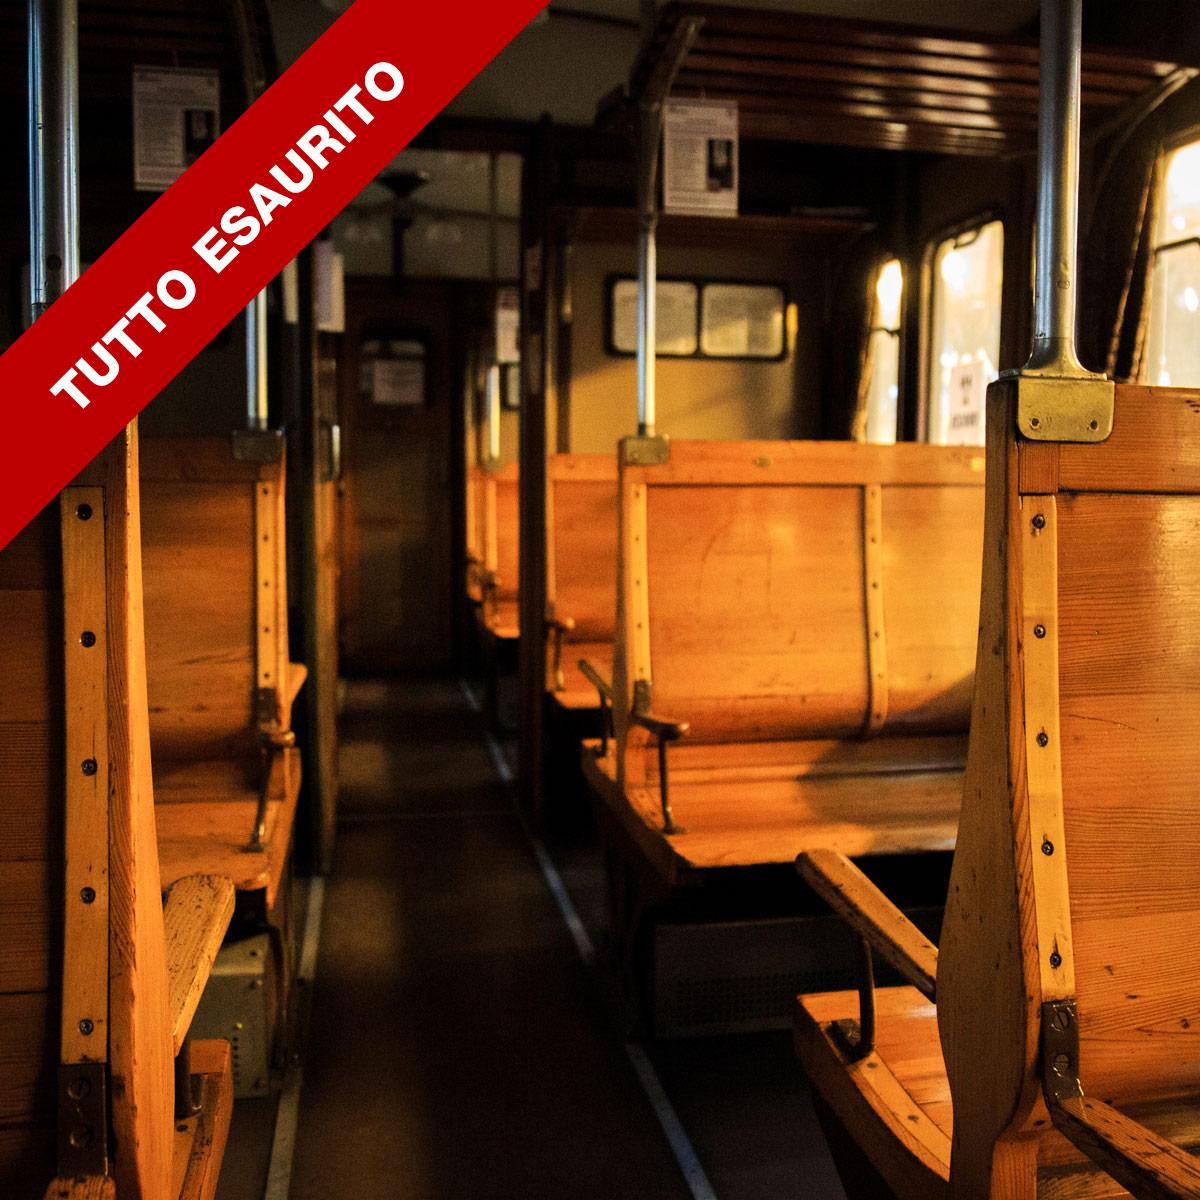 treno-gaud-ott-esaurito